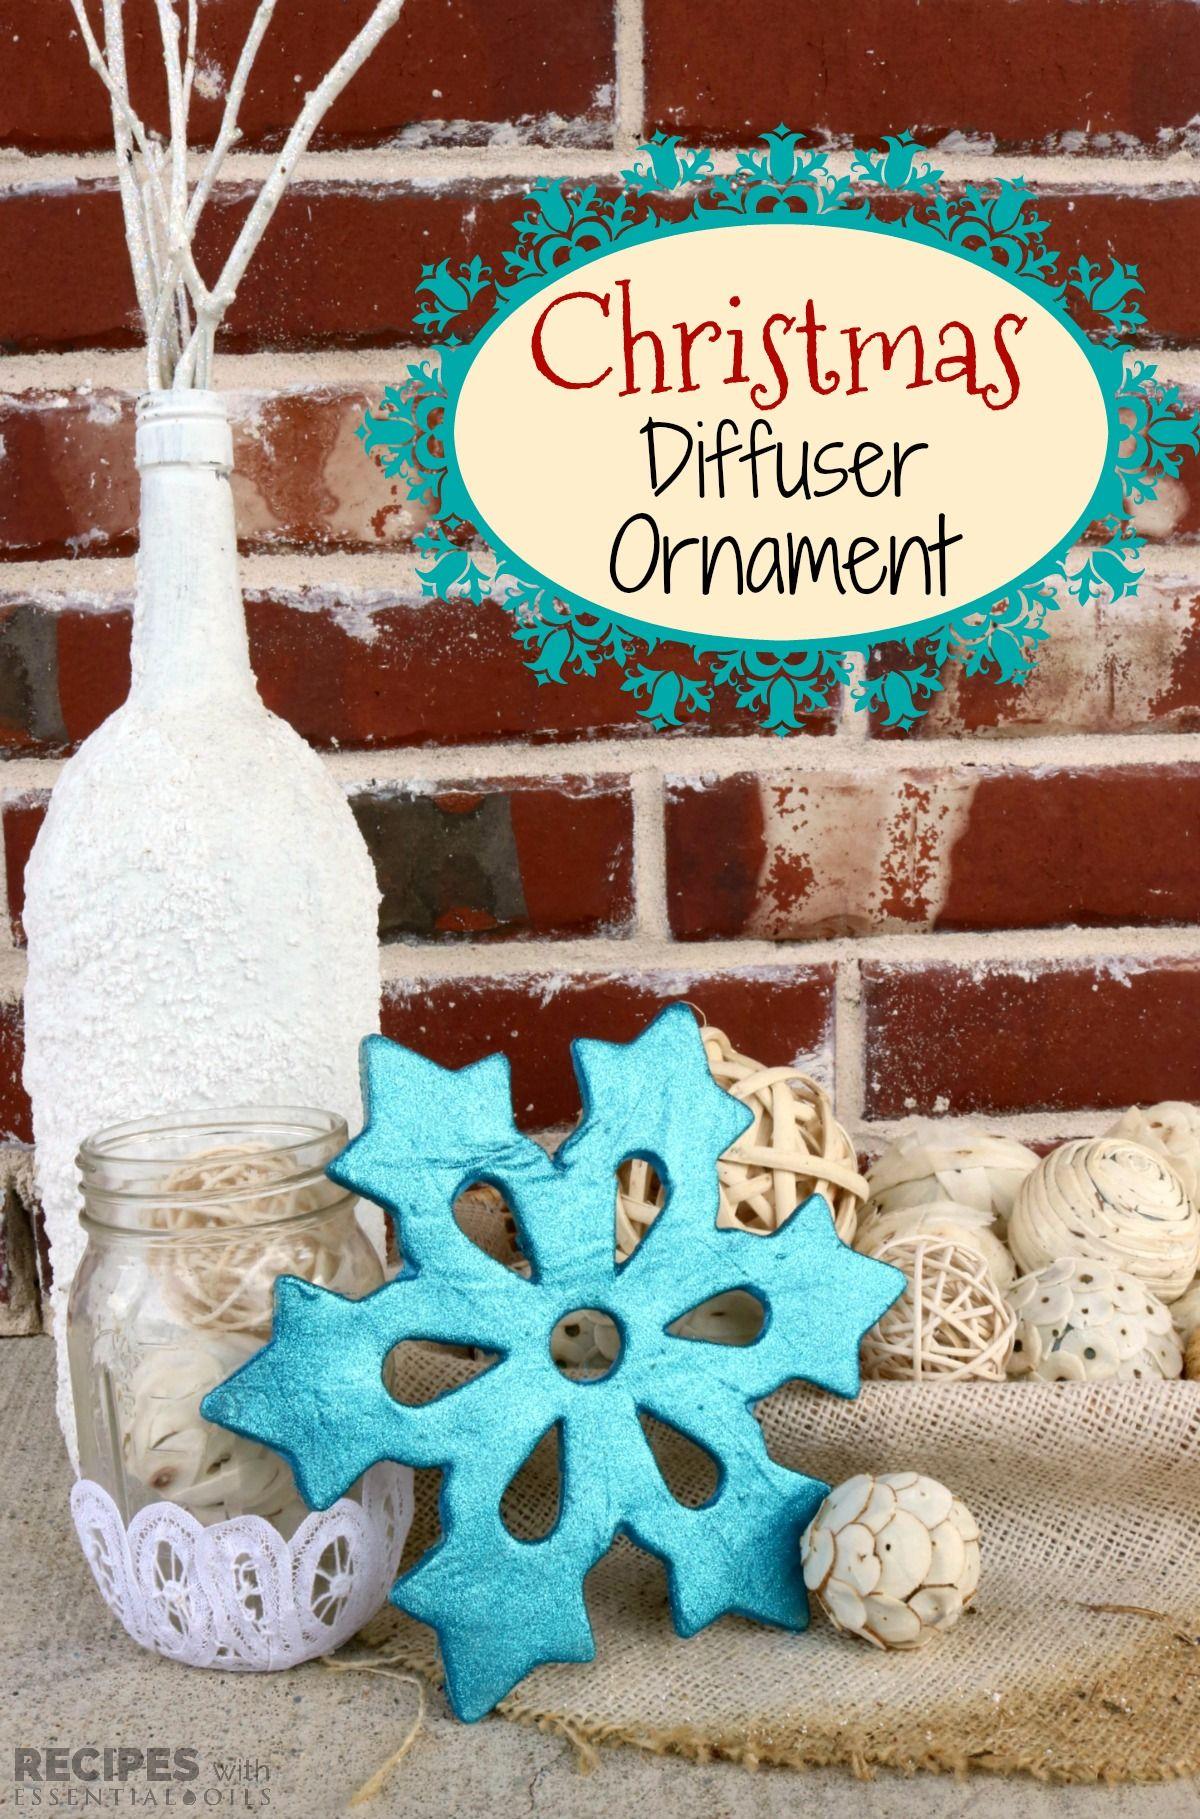 Christmas Diffuser Ornament | Essential oils christmas, Christmas crafts, Crafts